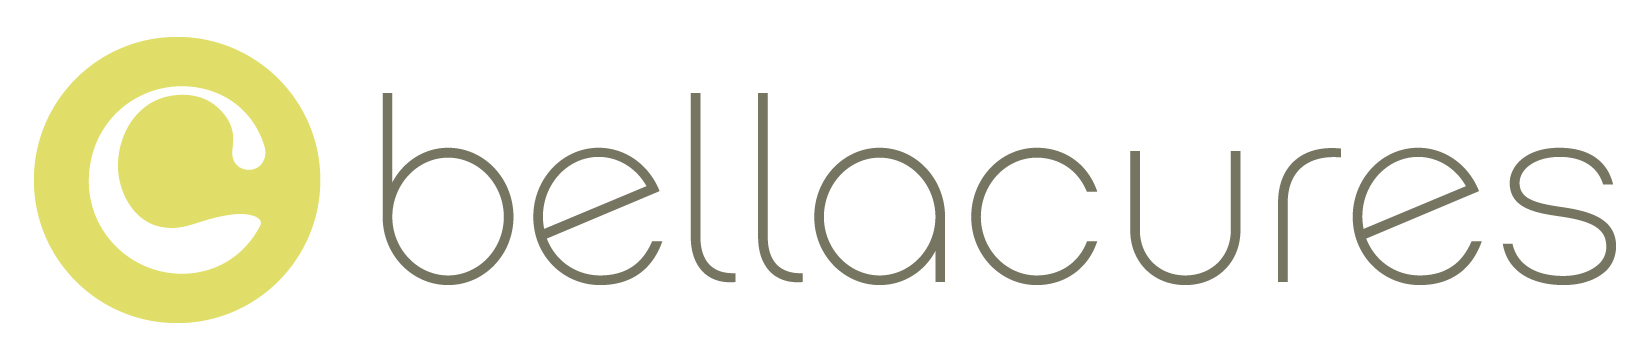 Bellacures logo